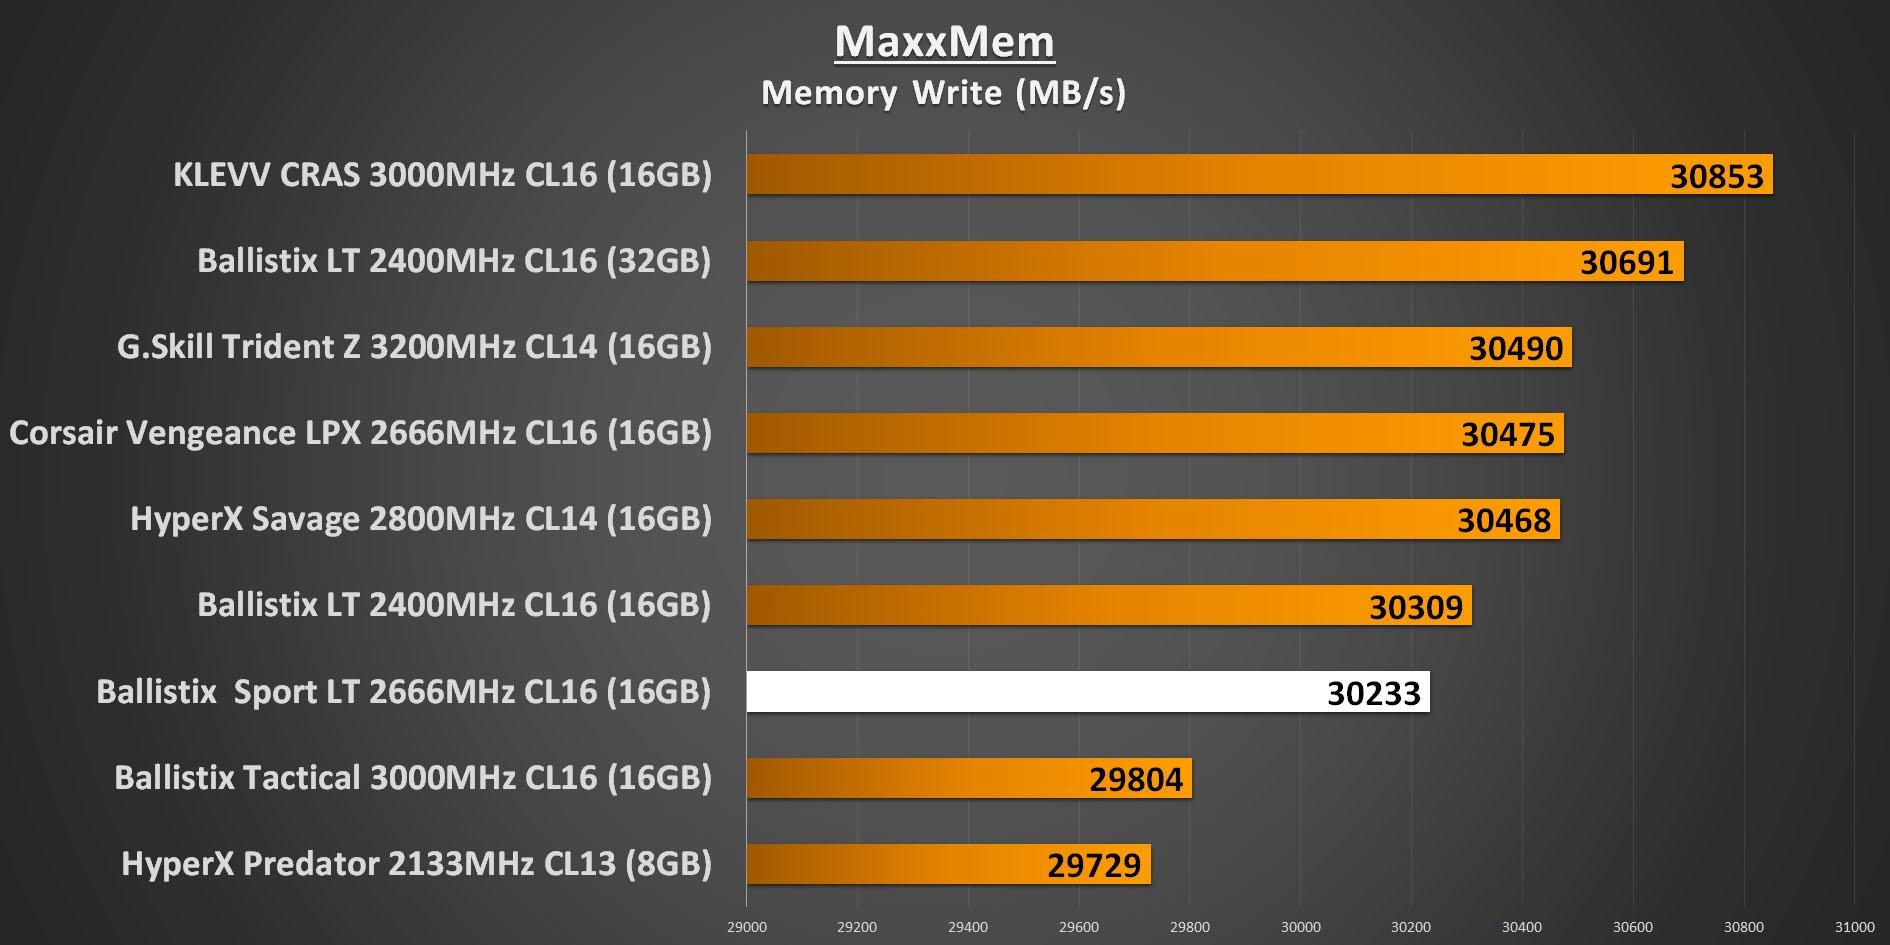 Ballistix Sport LT 2666MHz - MaxxMem Memory Write Performance